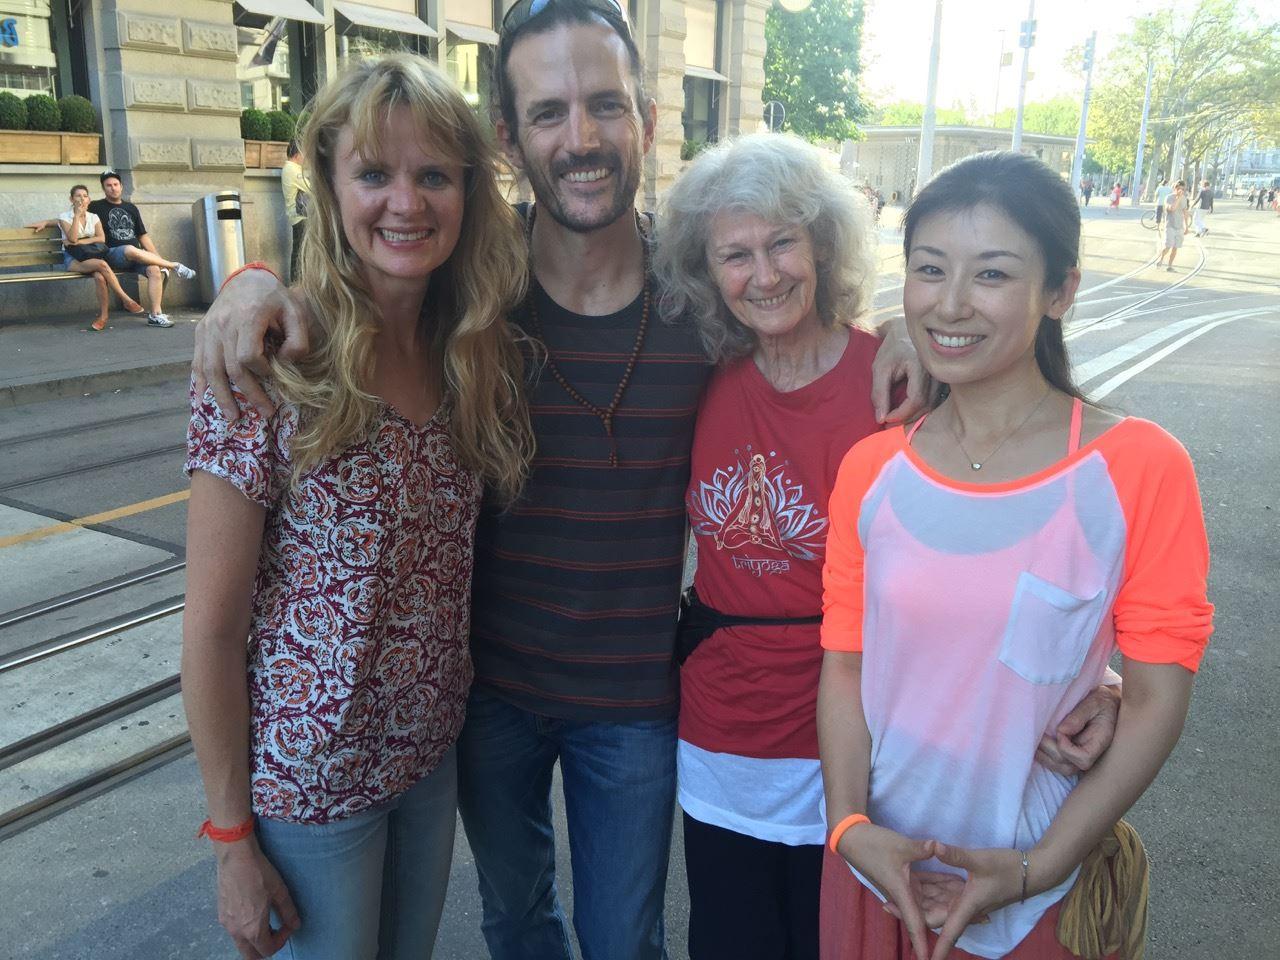 Santoshi, Rishi, Eva-Maria, and Kiki